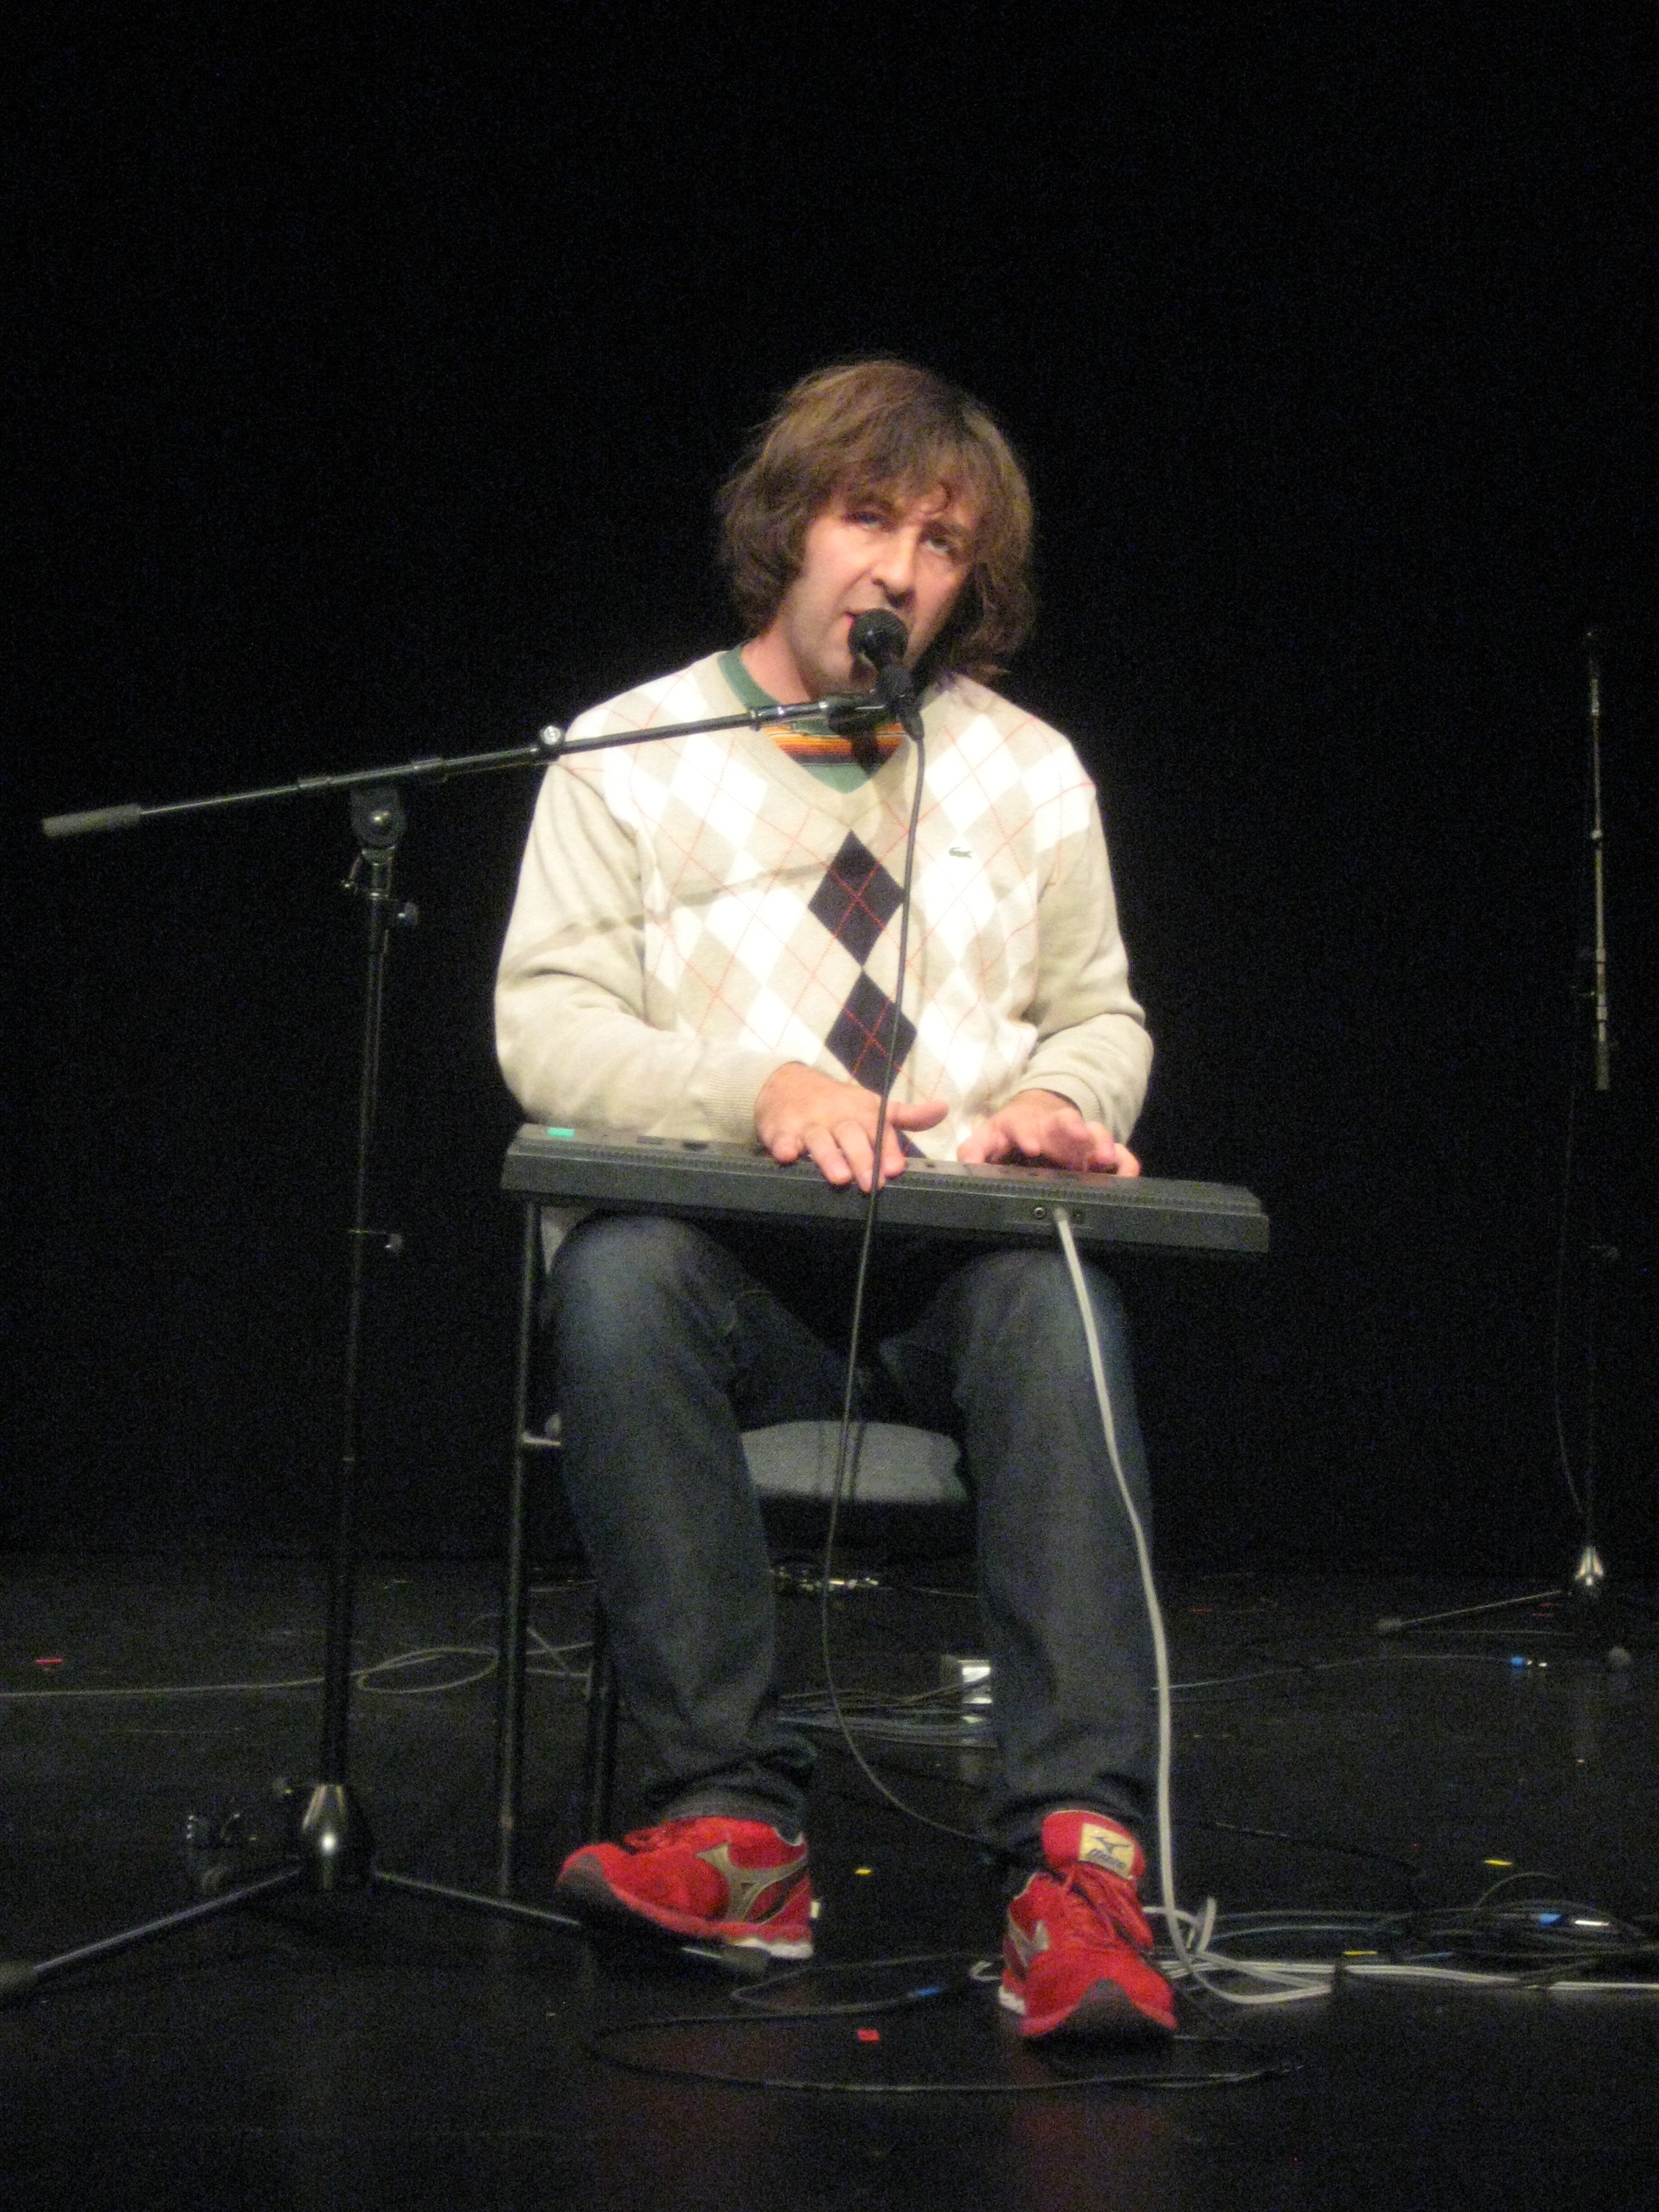 David O'Doherty - Giggle Me Timbers (Or 'Jokes Ahoy!')